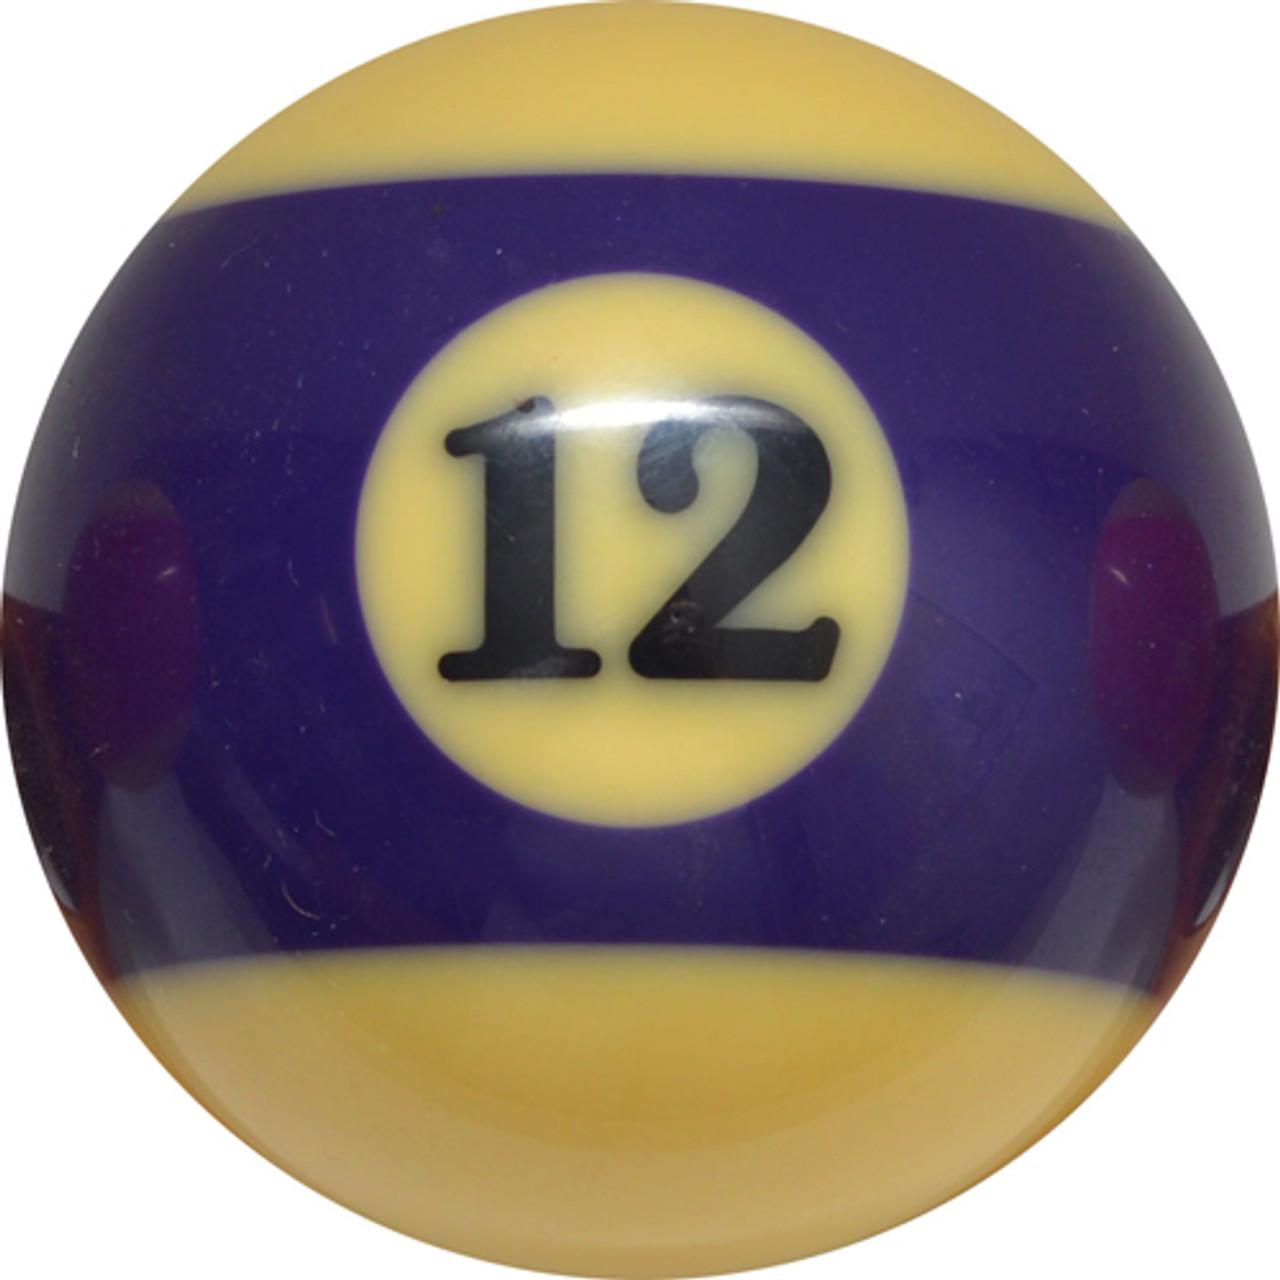 Super Aramith Pro Replacement Ball #12